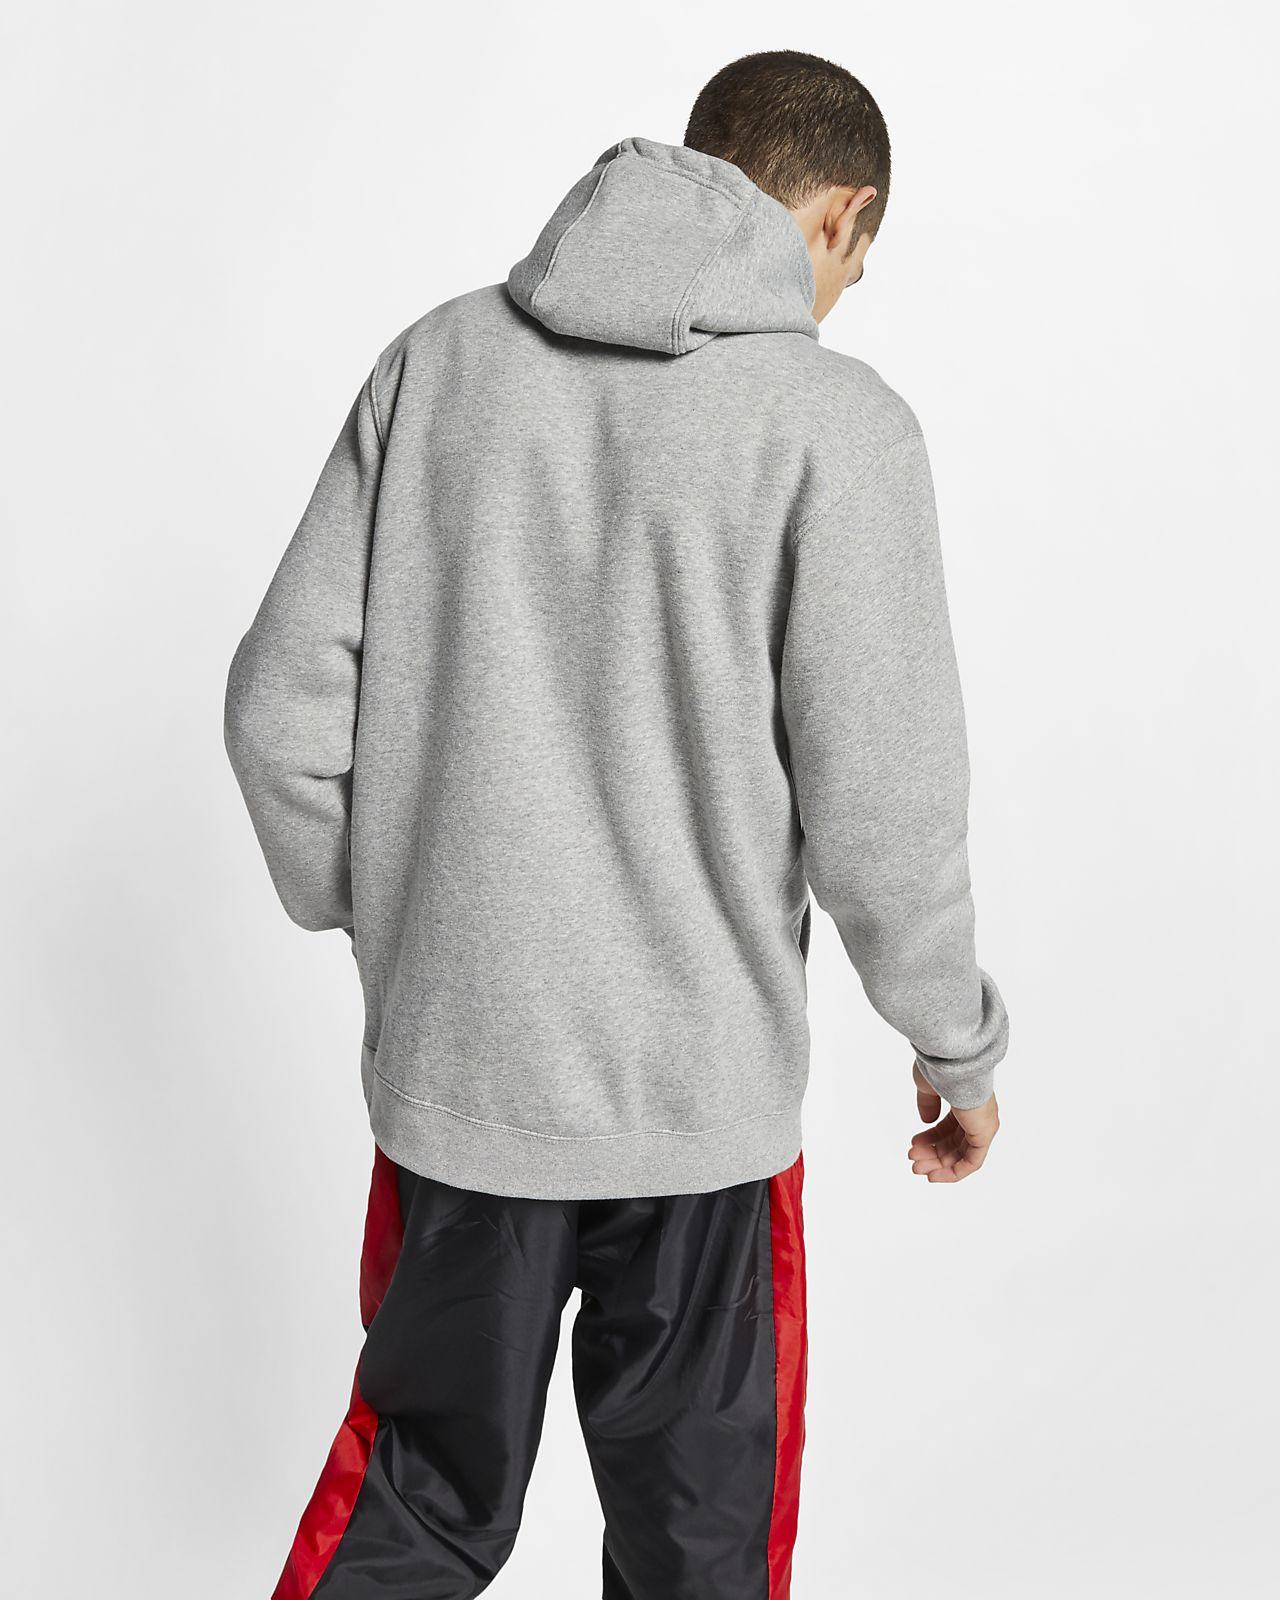 23885b0cd344 Nike Sportswear Club Fleece Men s Hoodie. Nike.com GB